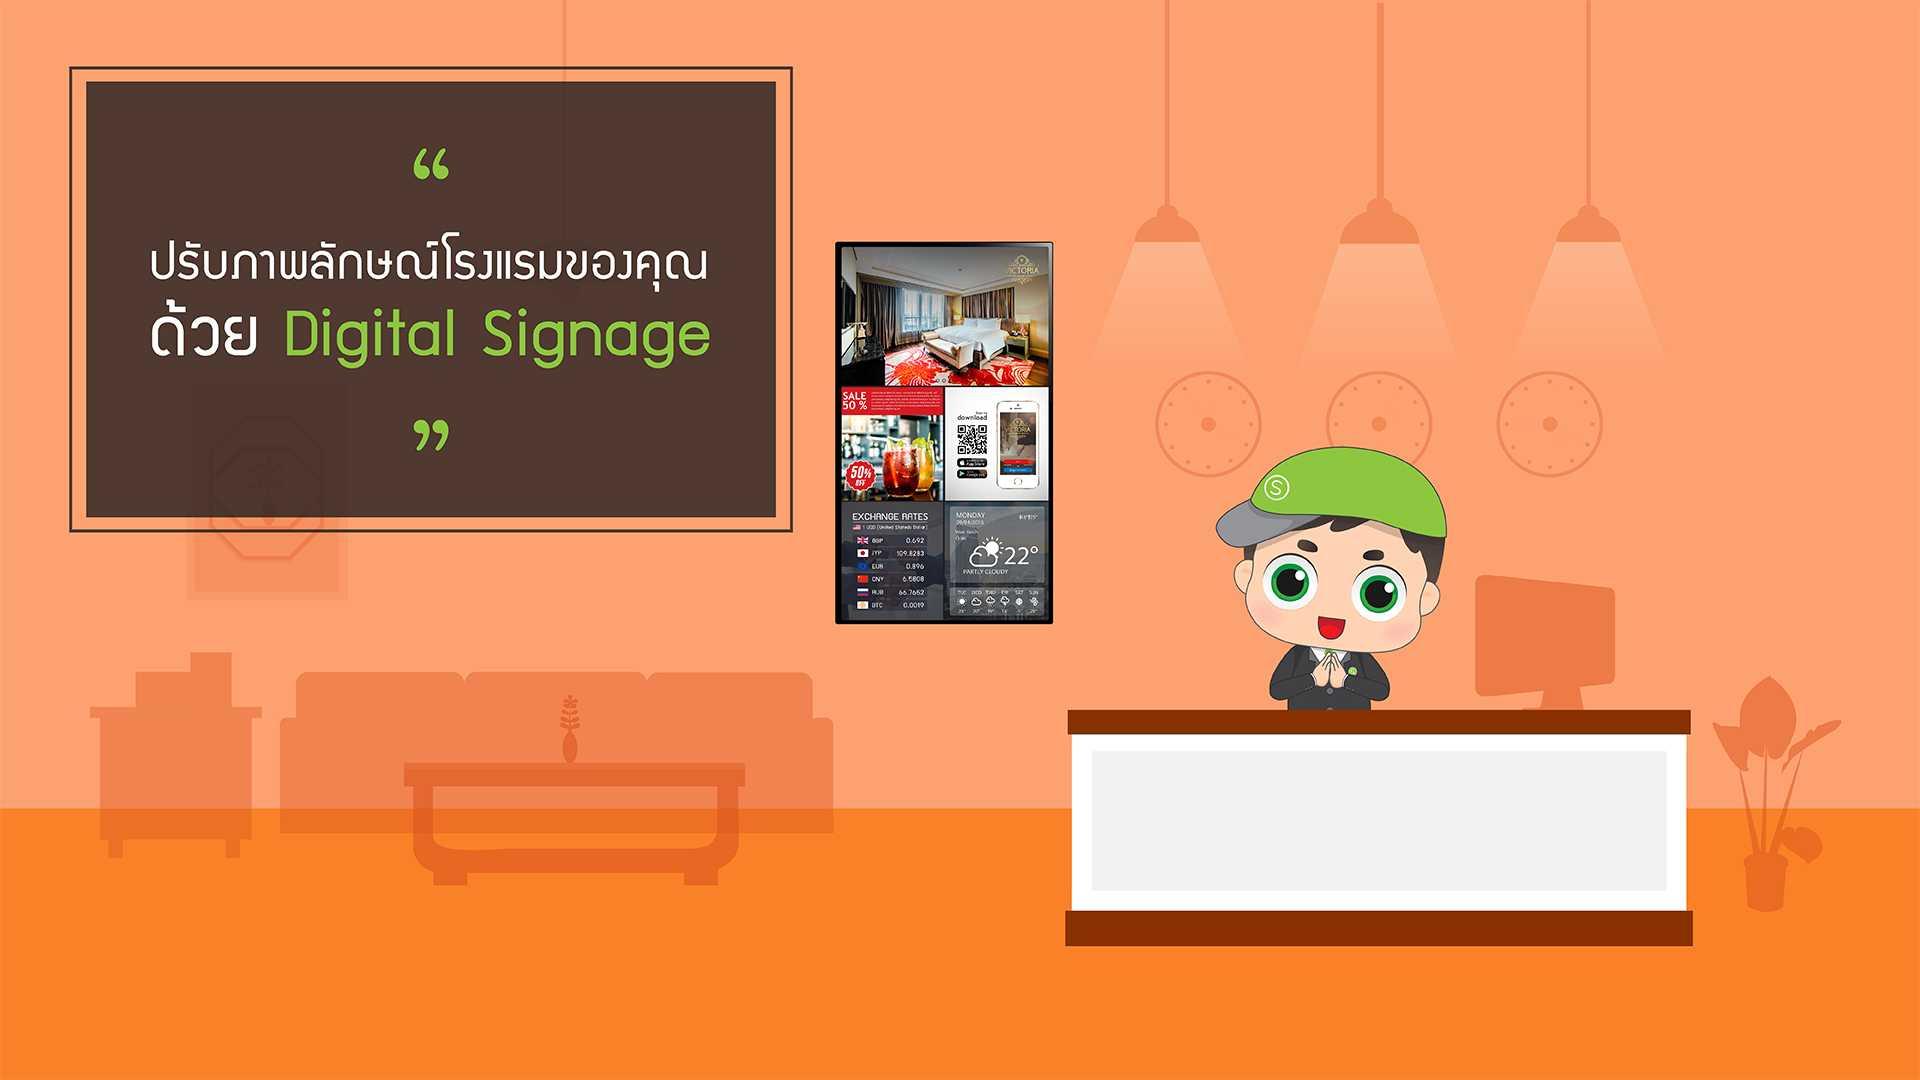 Digital Signage สำหรับธุรกิจโรงแรม รีสอร์ท ที่พักและการจัดอีเวนท์ต่าง ๆ